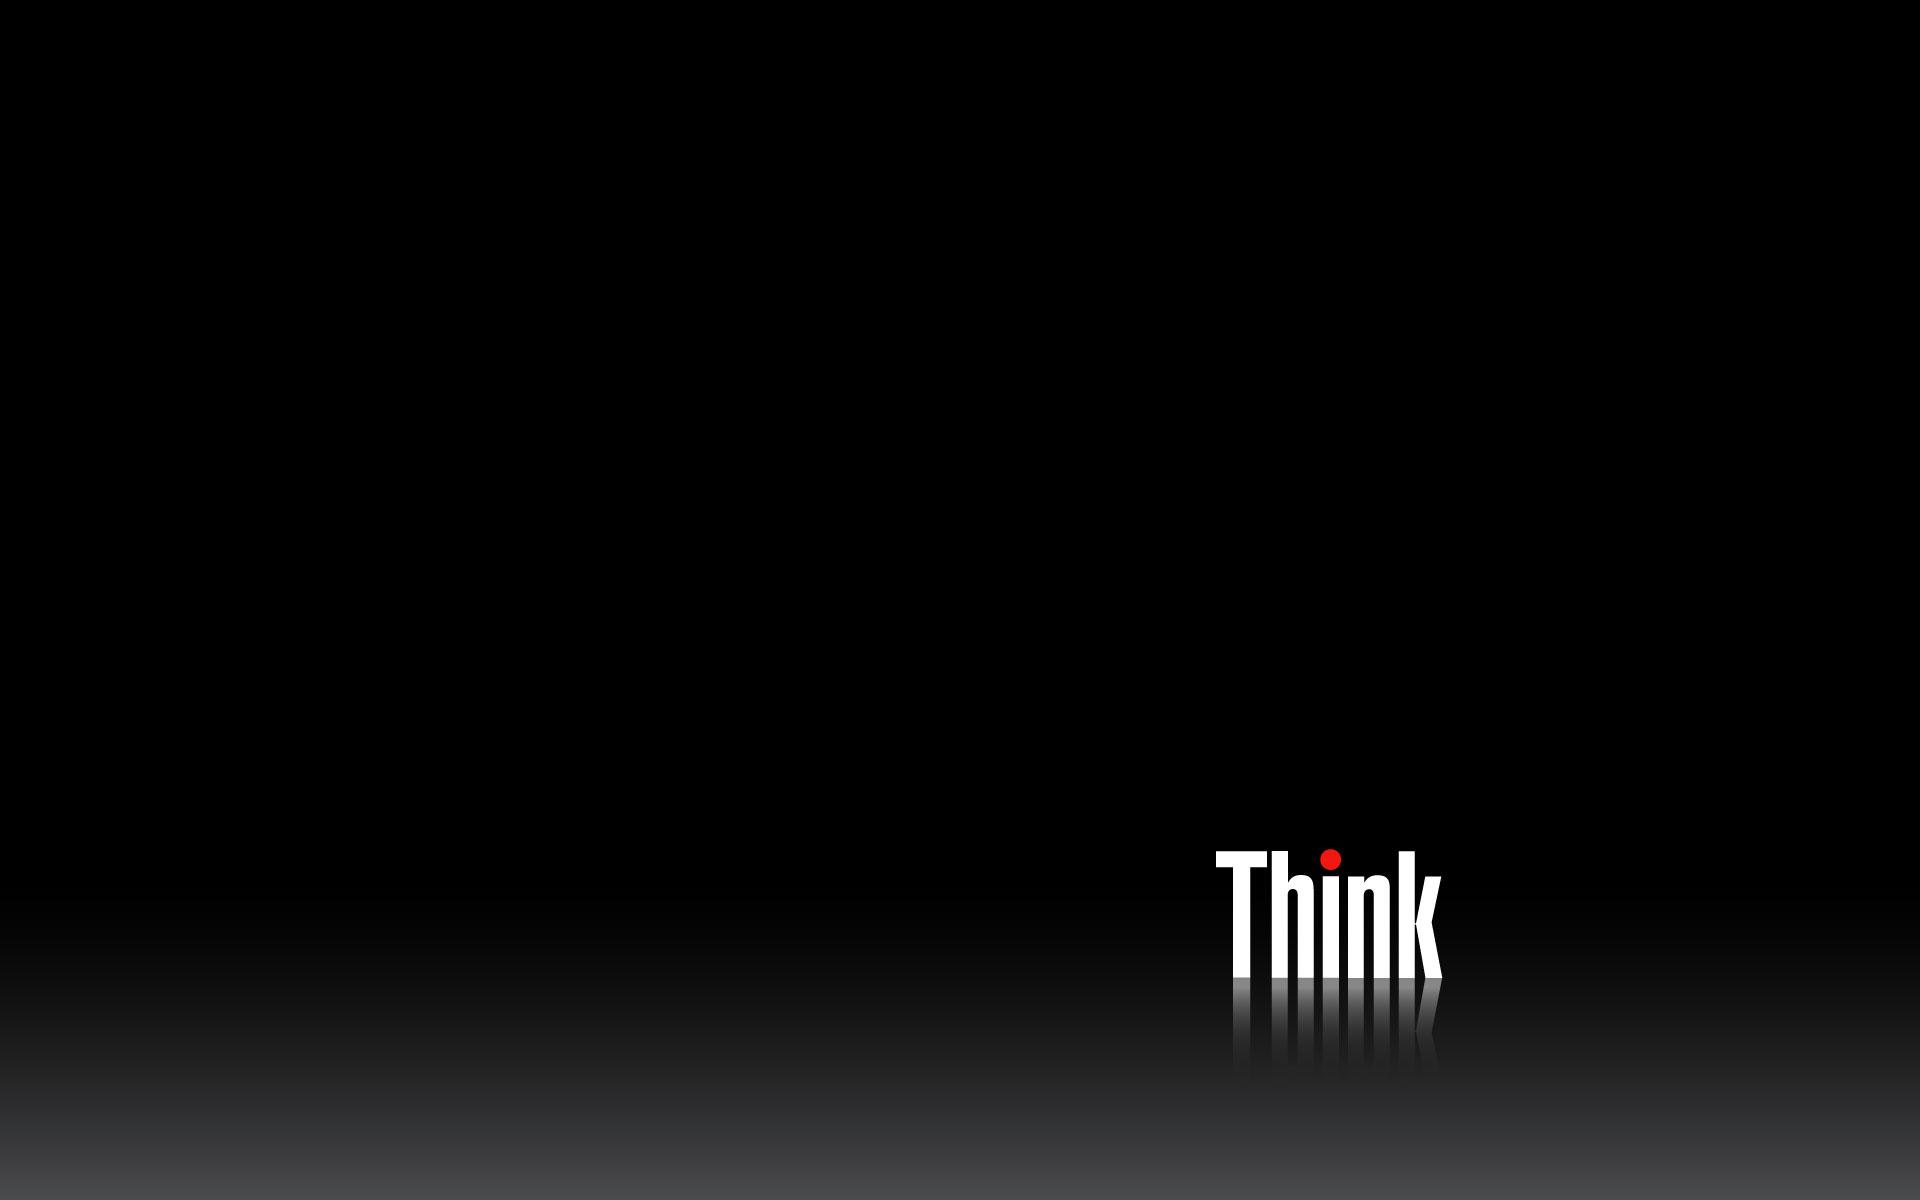 69 Ibm Thinkpad Wallpaper On Wallpapersafari